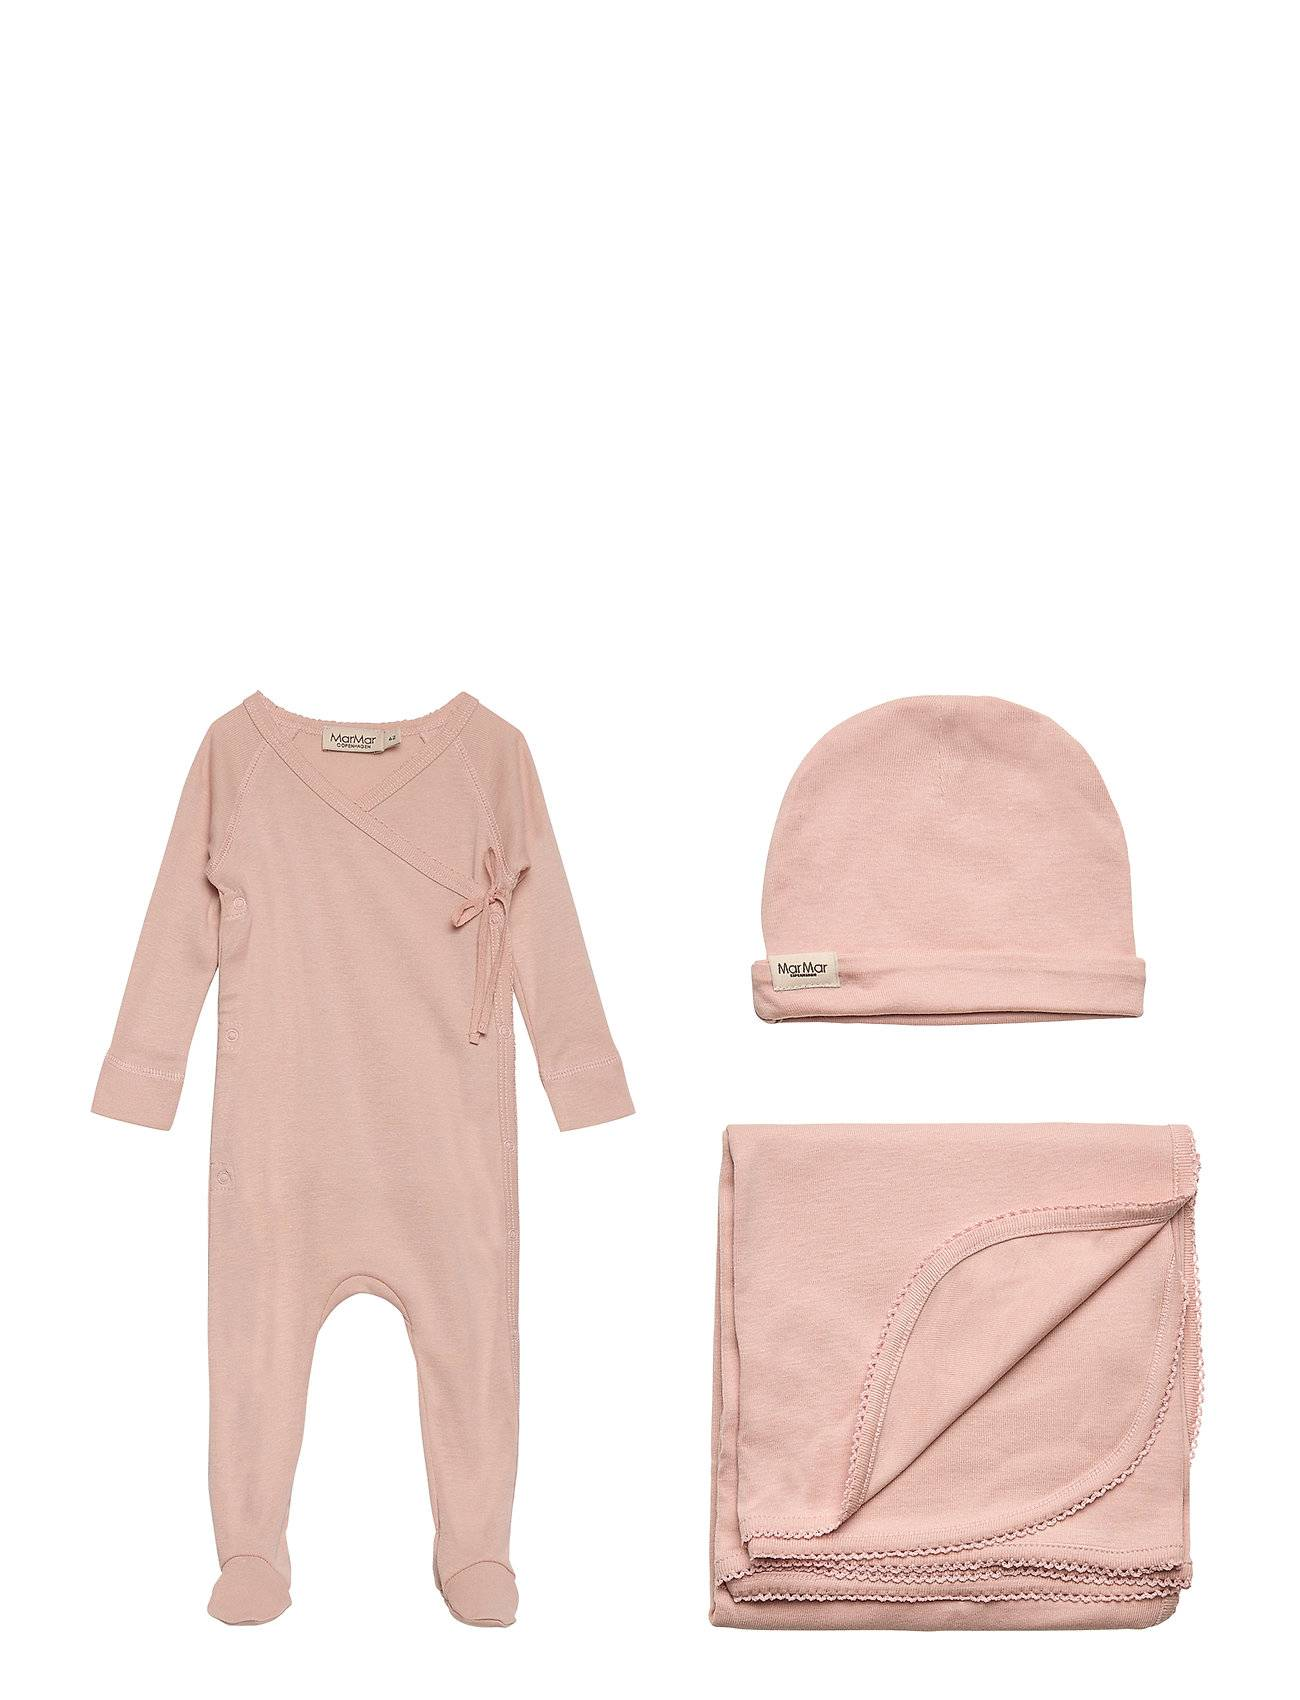 MARMAR CPH New Born Gift Box - Suit, Hat And Blanket Body Langermet Rosa MARMAR CPH